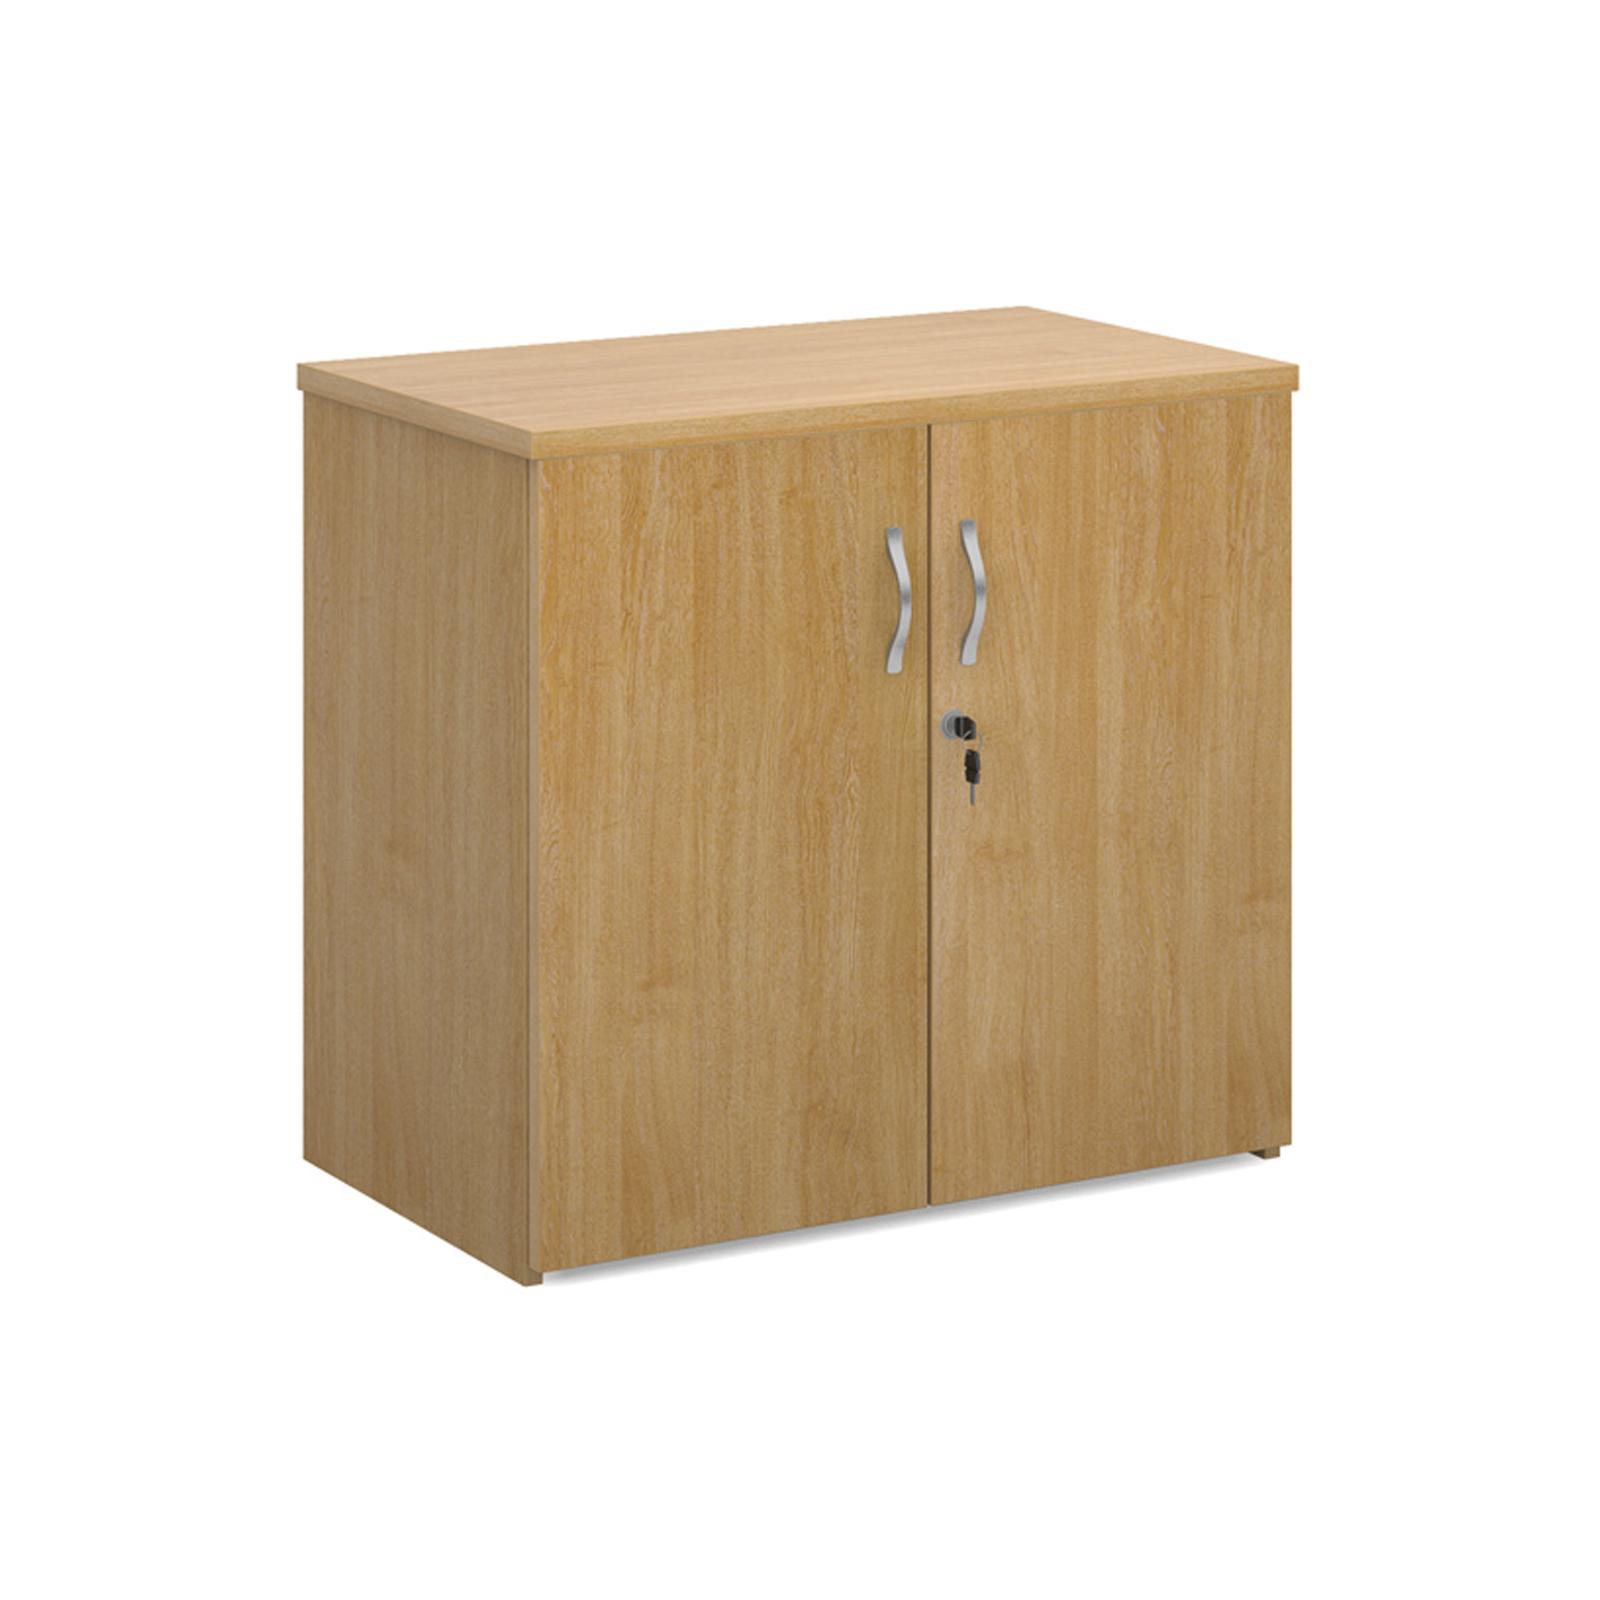 Up to 1200mm High Universal double door cupboard 740mm high with 1 shelf - oak